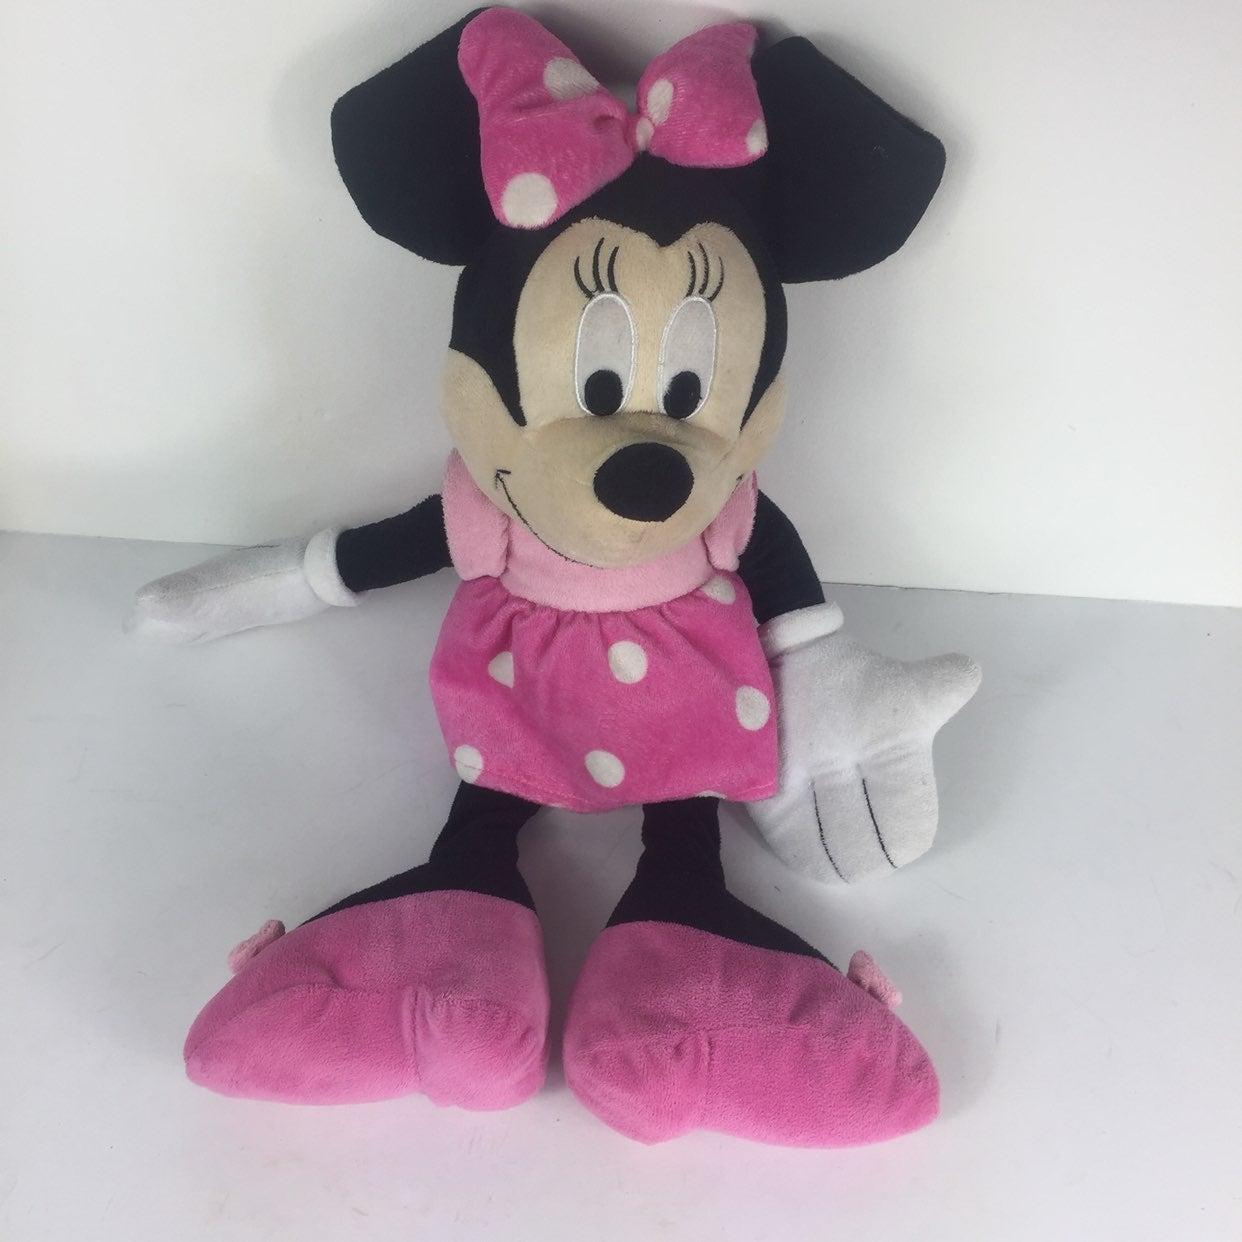 Disney Minnie Mouse Plush Stuffed Doll